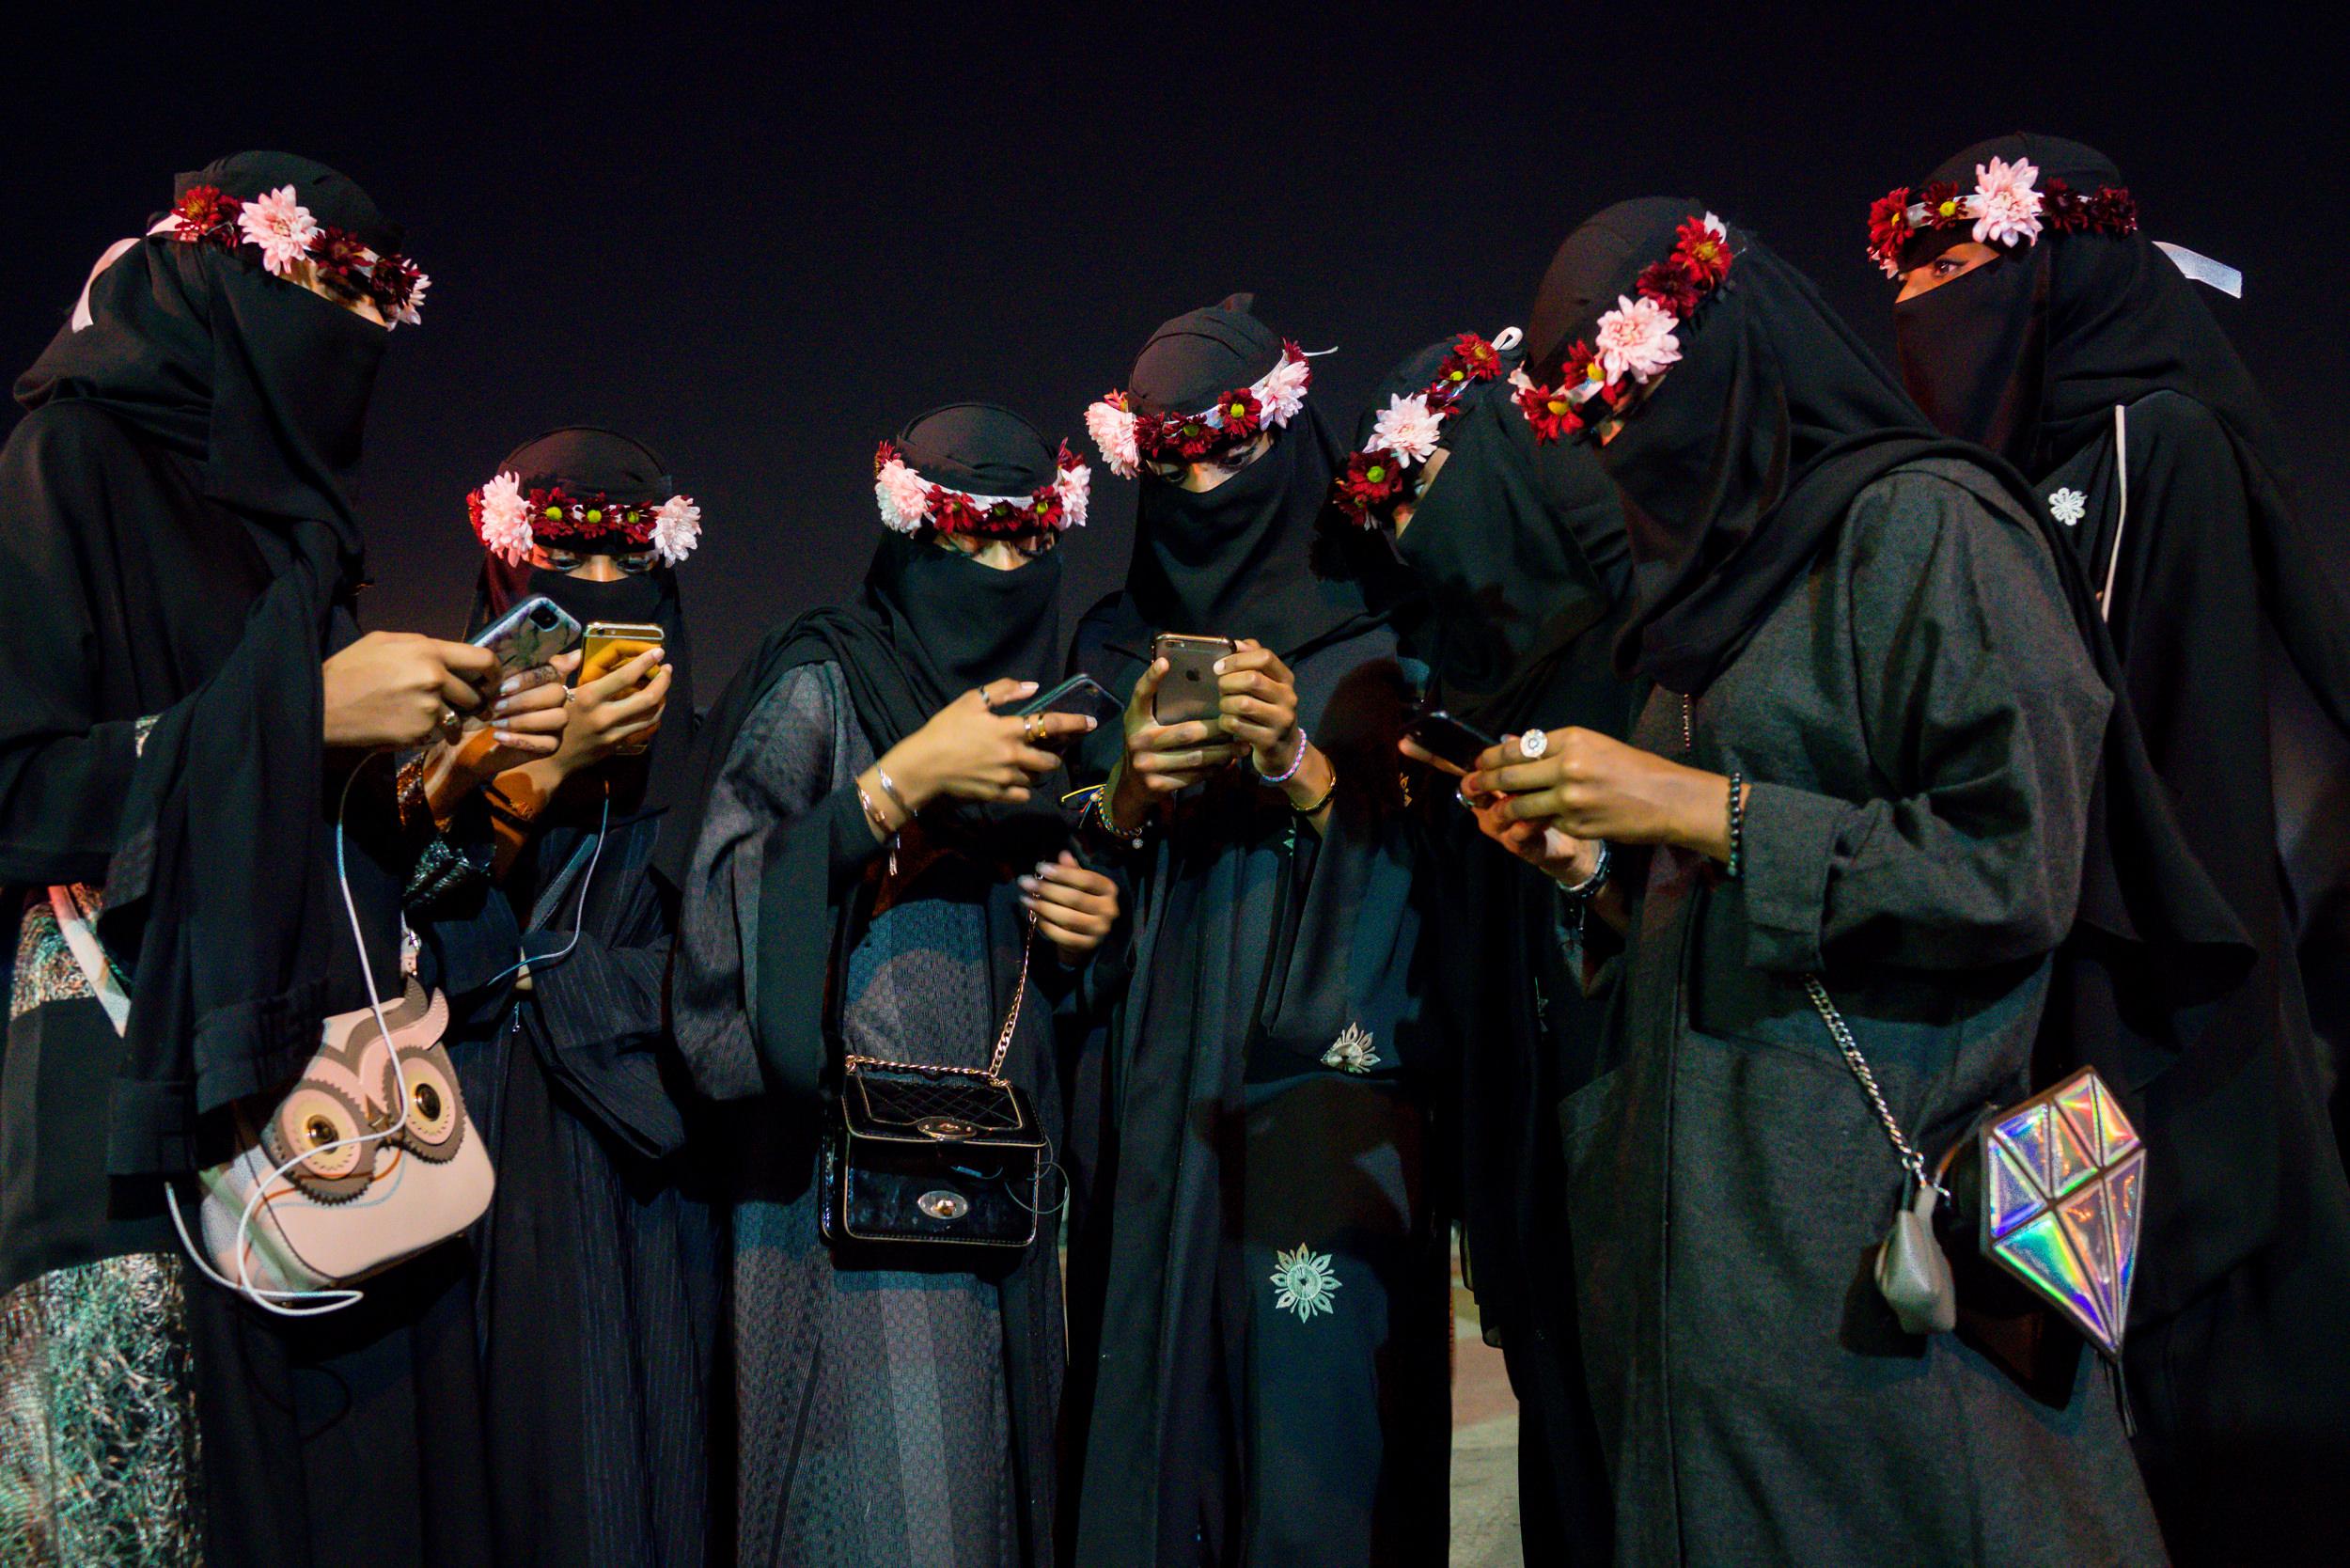 Saudi Arabia – Aug 1, 2018: A group of relatives busy on their social media phone applications, at Al-Jenadriyah, a cultural festival in Riyadh. Photo by: Tasneem Alsultan